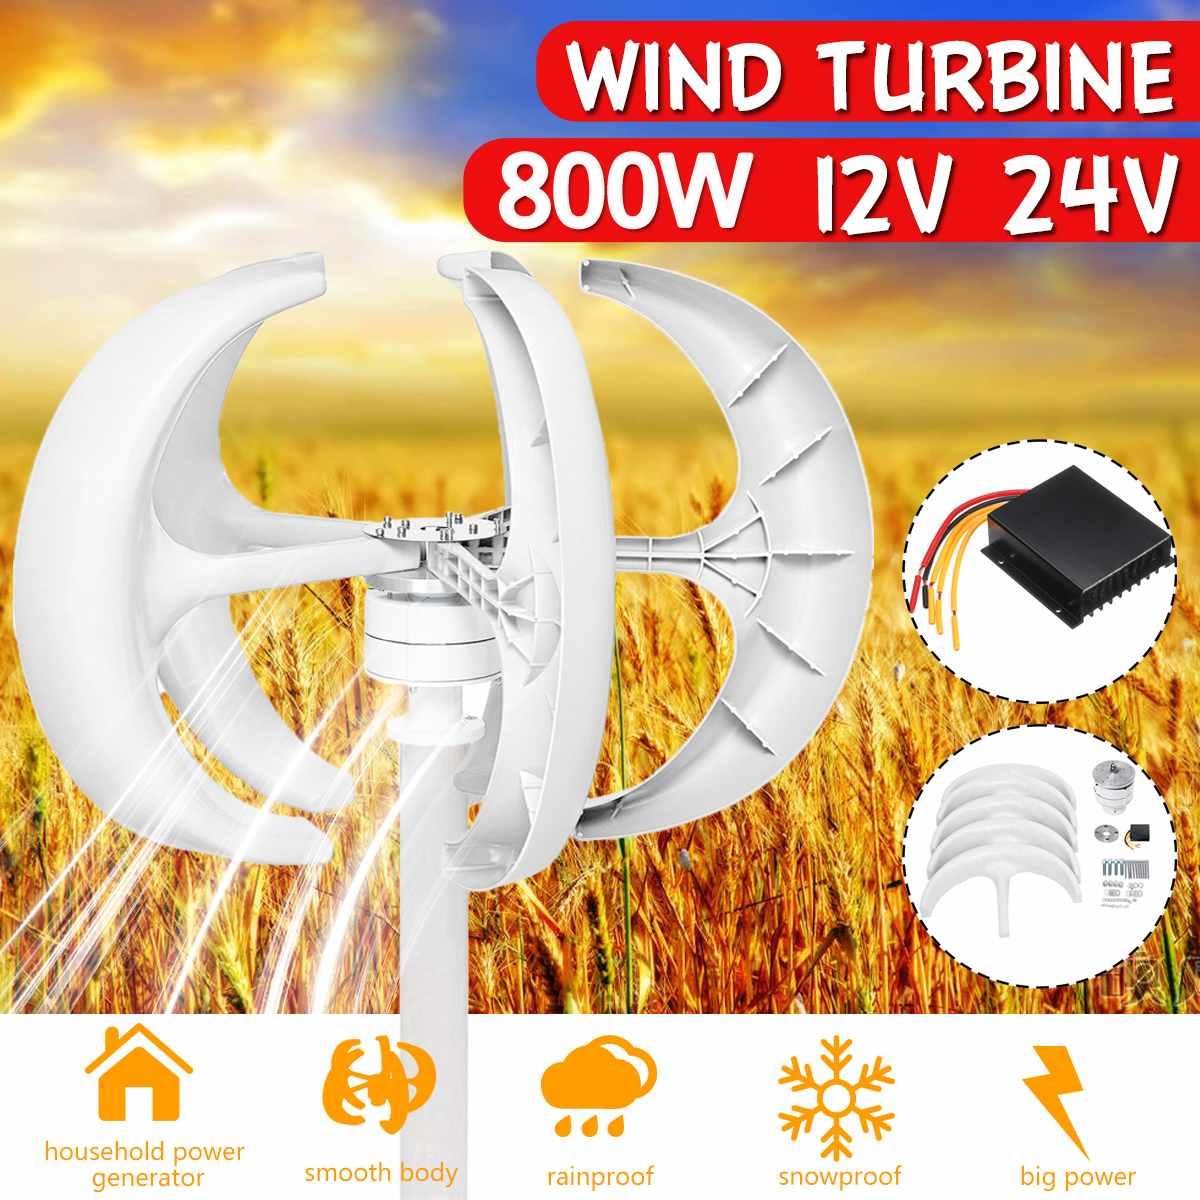 800W Vertical Axis Wind Turbines Generator Lantern 12V 24V 5 Blades Motor Kit For Home Hybrid